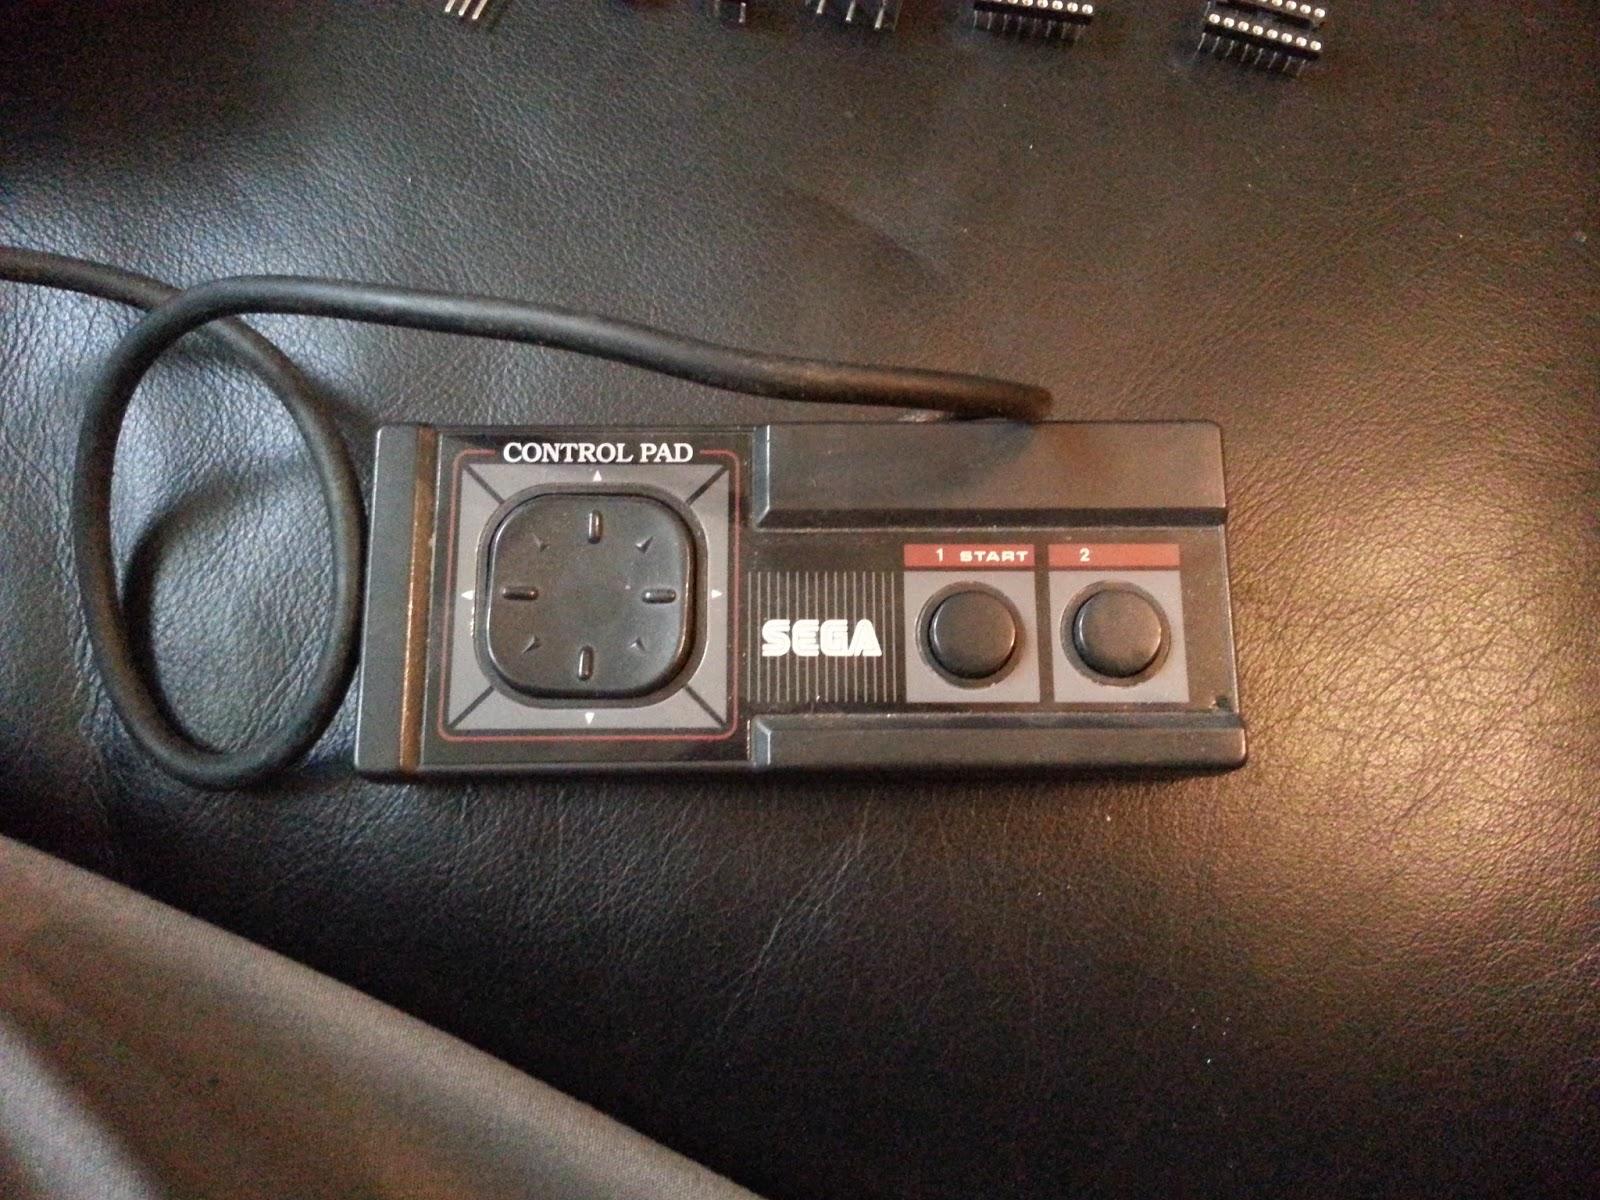 Original Sega Master System controller.